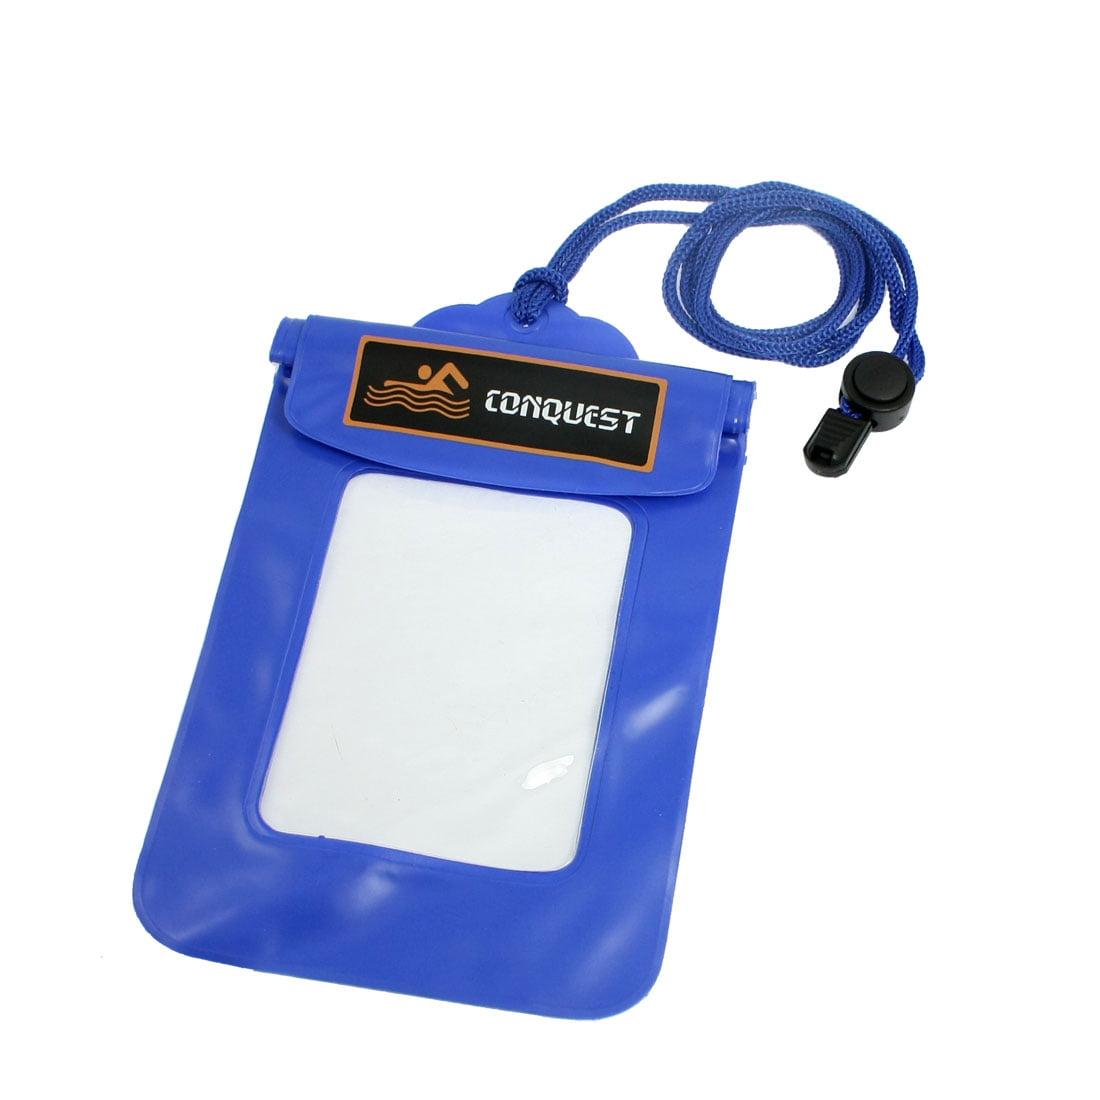 Detachable Closure Water Resistant Bag Case Pouch Blue for Camera Phone